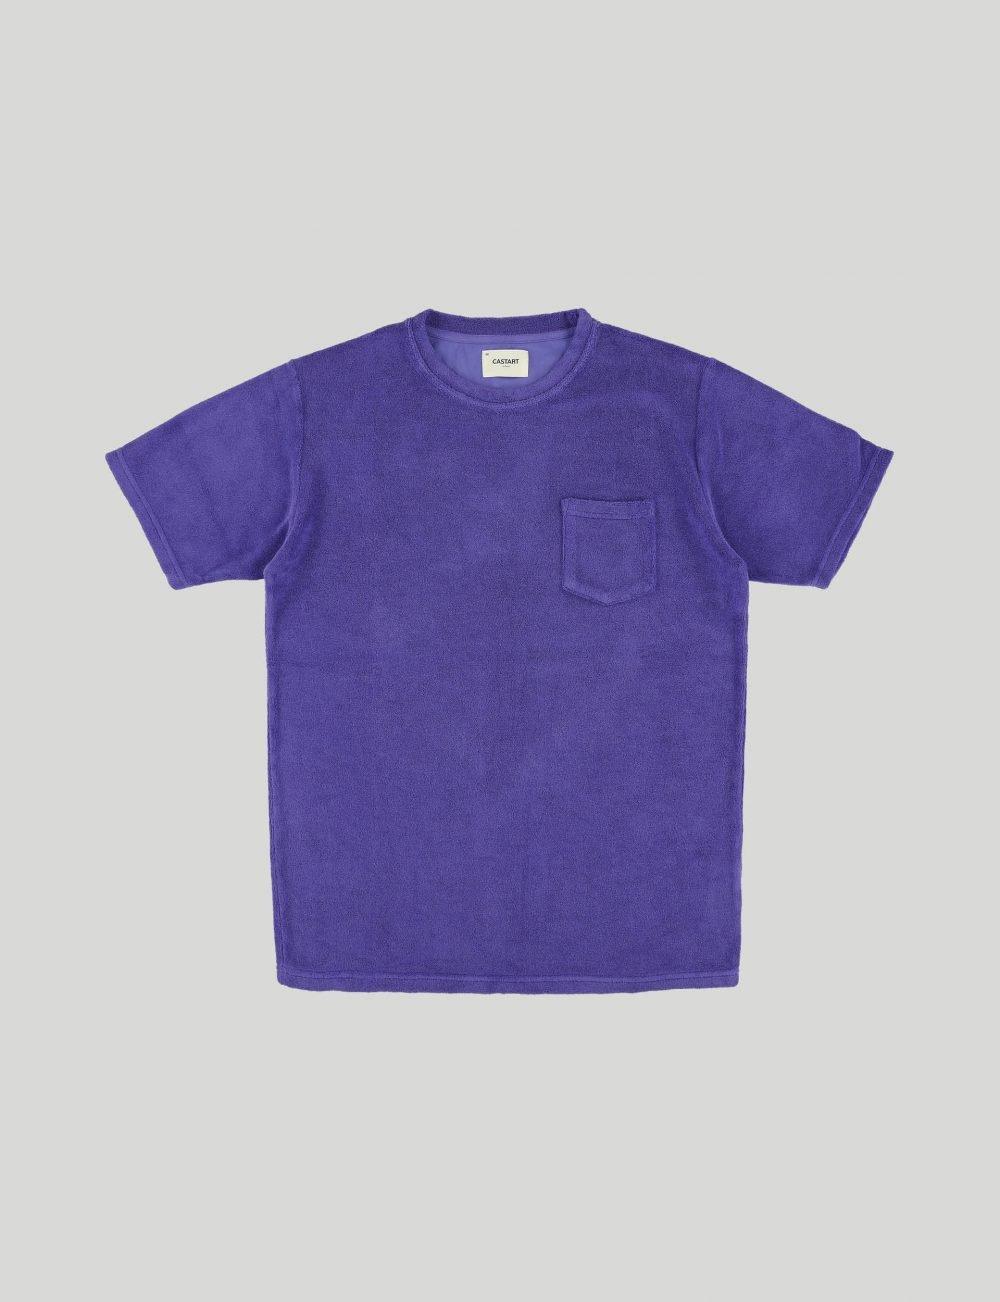 Castart - Seabase Tee - Purple